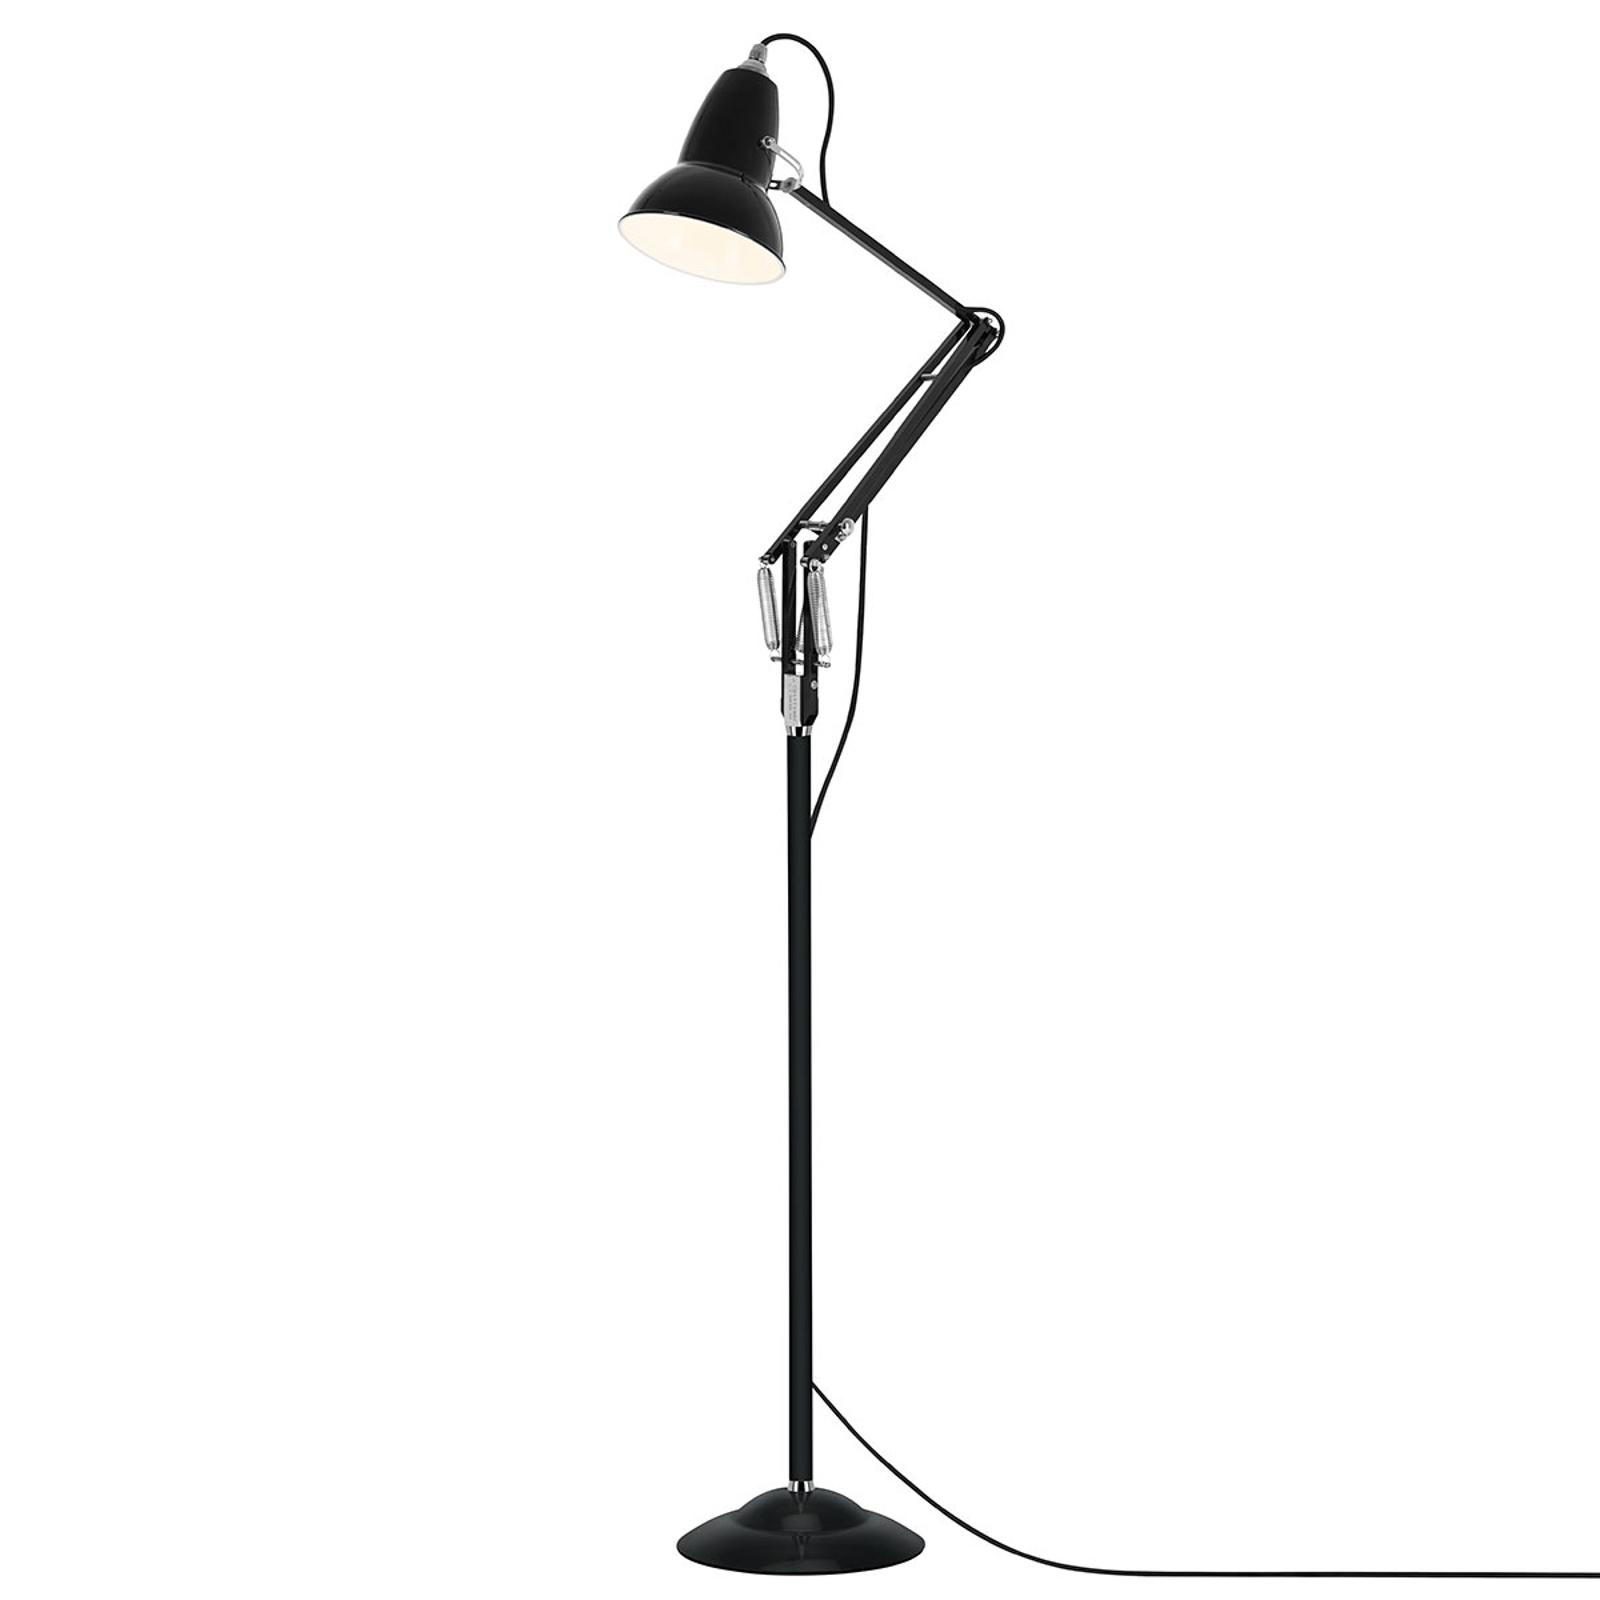 Anglepoise Original 1227 lampa stojąca czarna